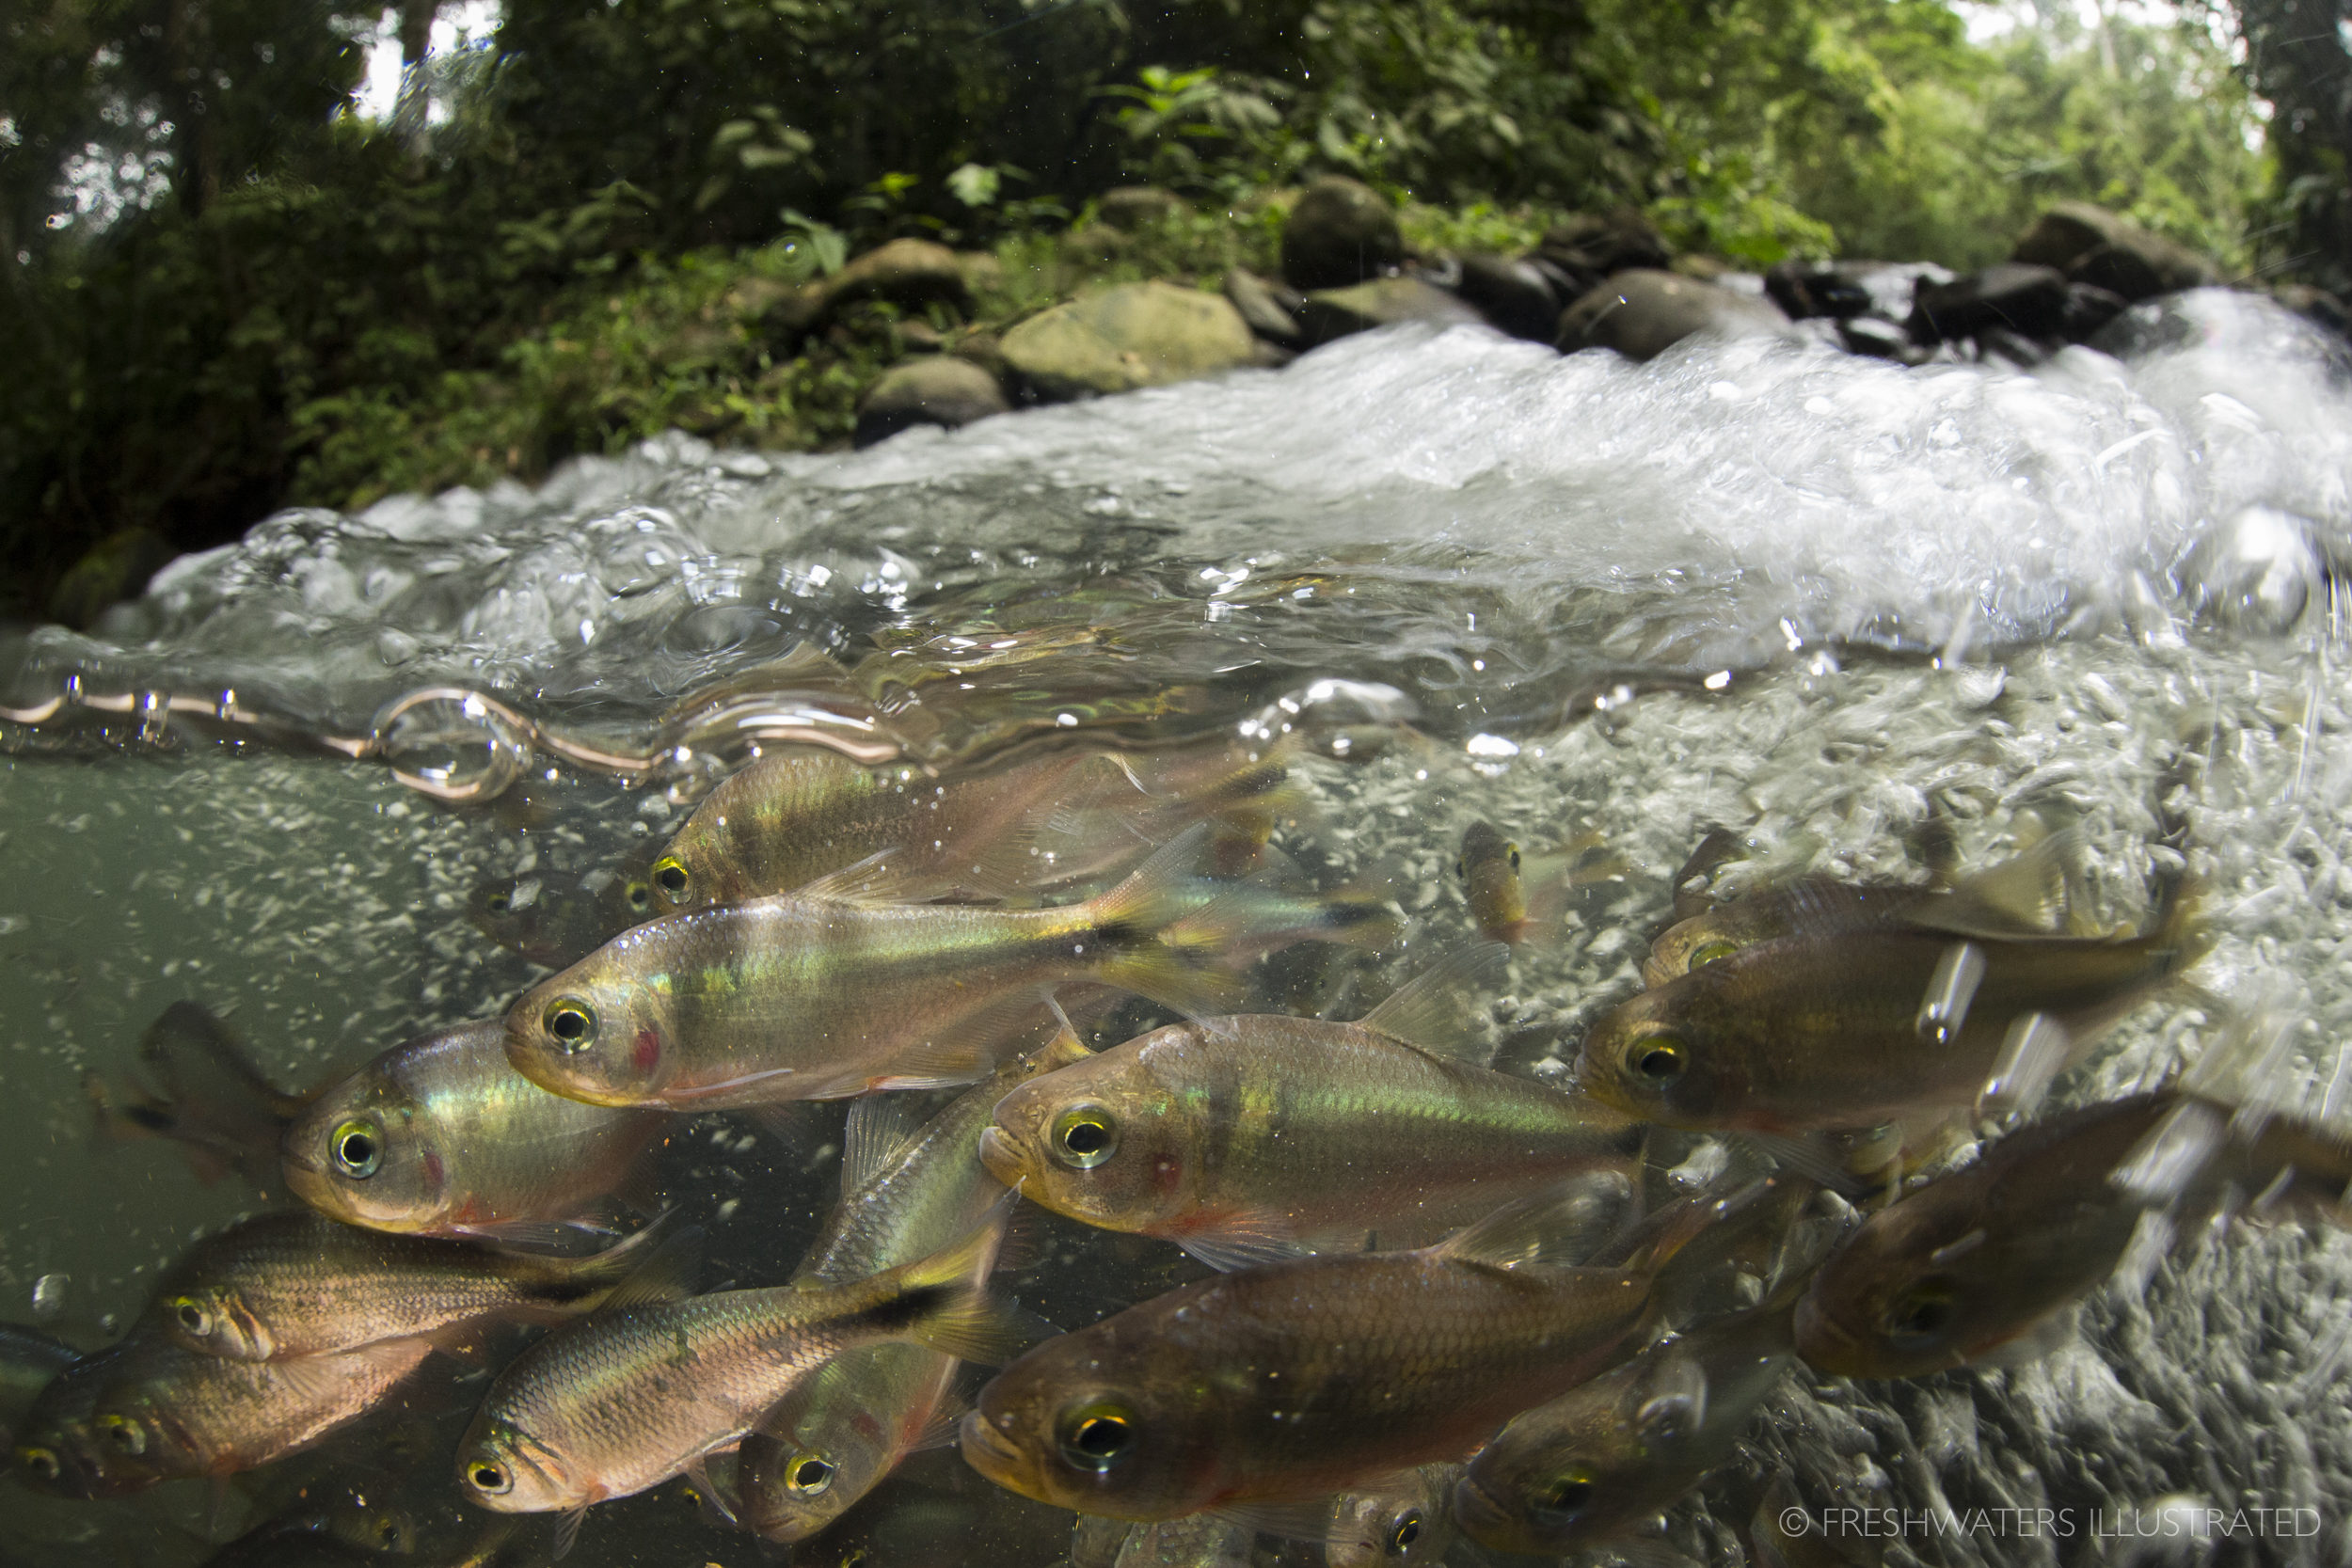 Rio Carbon, Costa Rica Schooling Creek Tetra (Bryconamericus scleroparius)